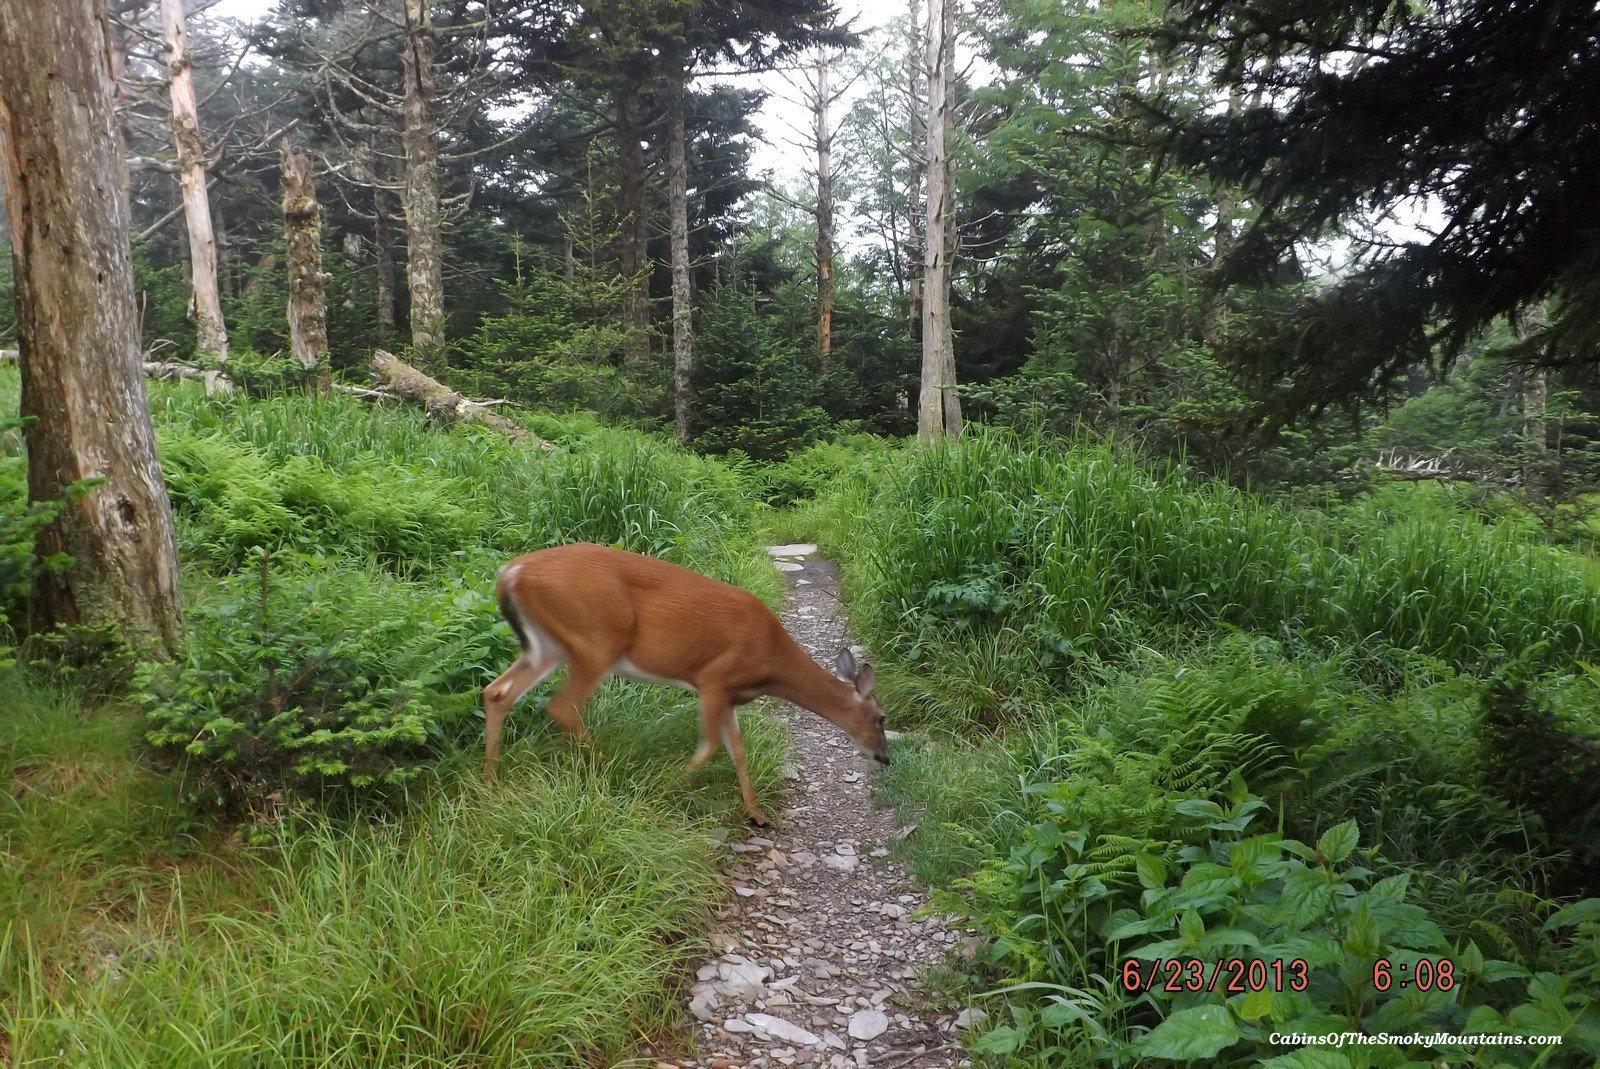 Smoky Mountain Hiking Trails: Mt. LeConte